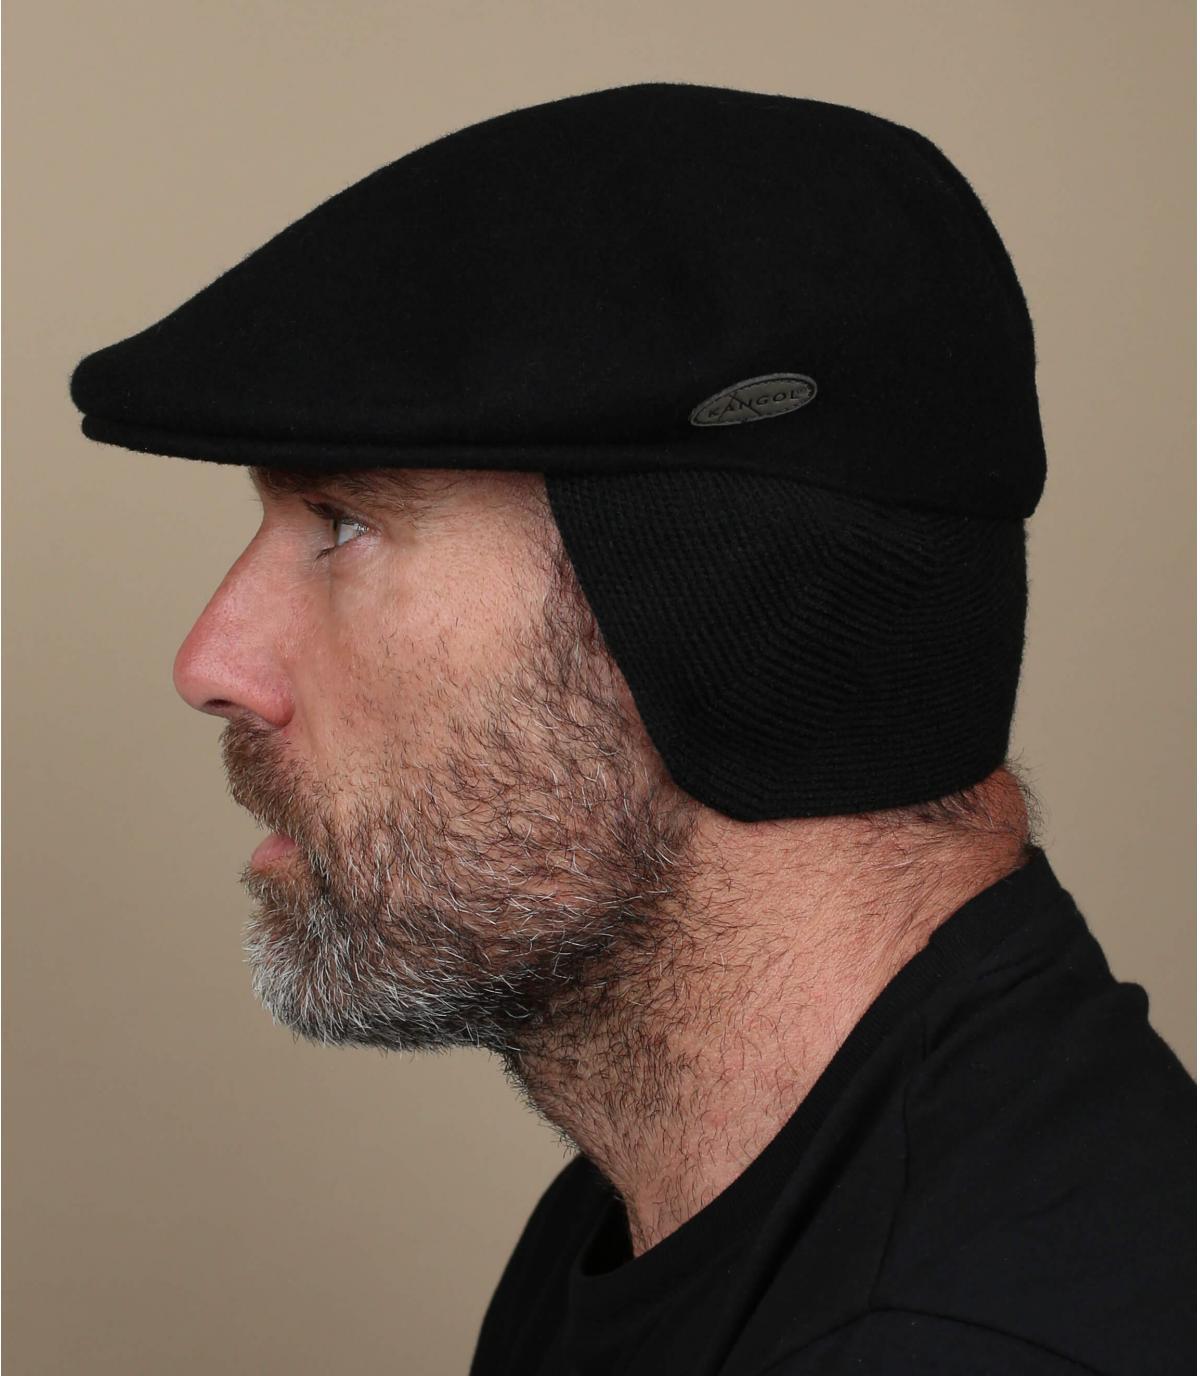 Black ivy cap earflaps